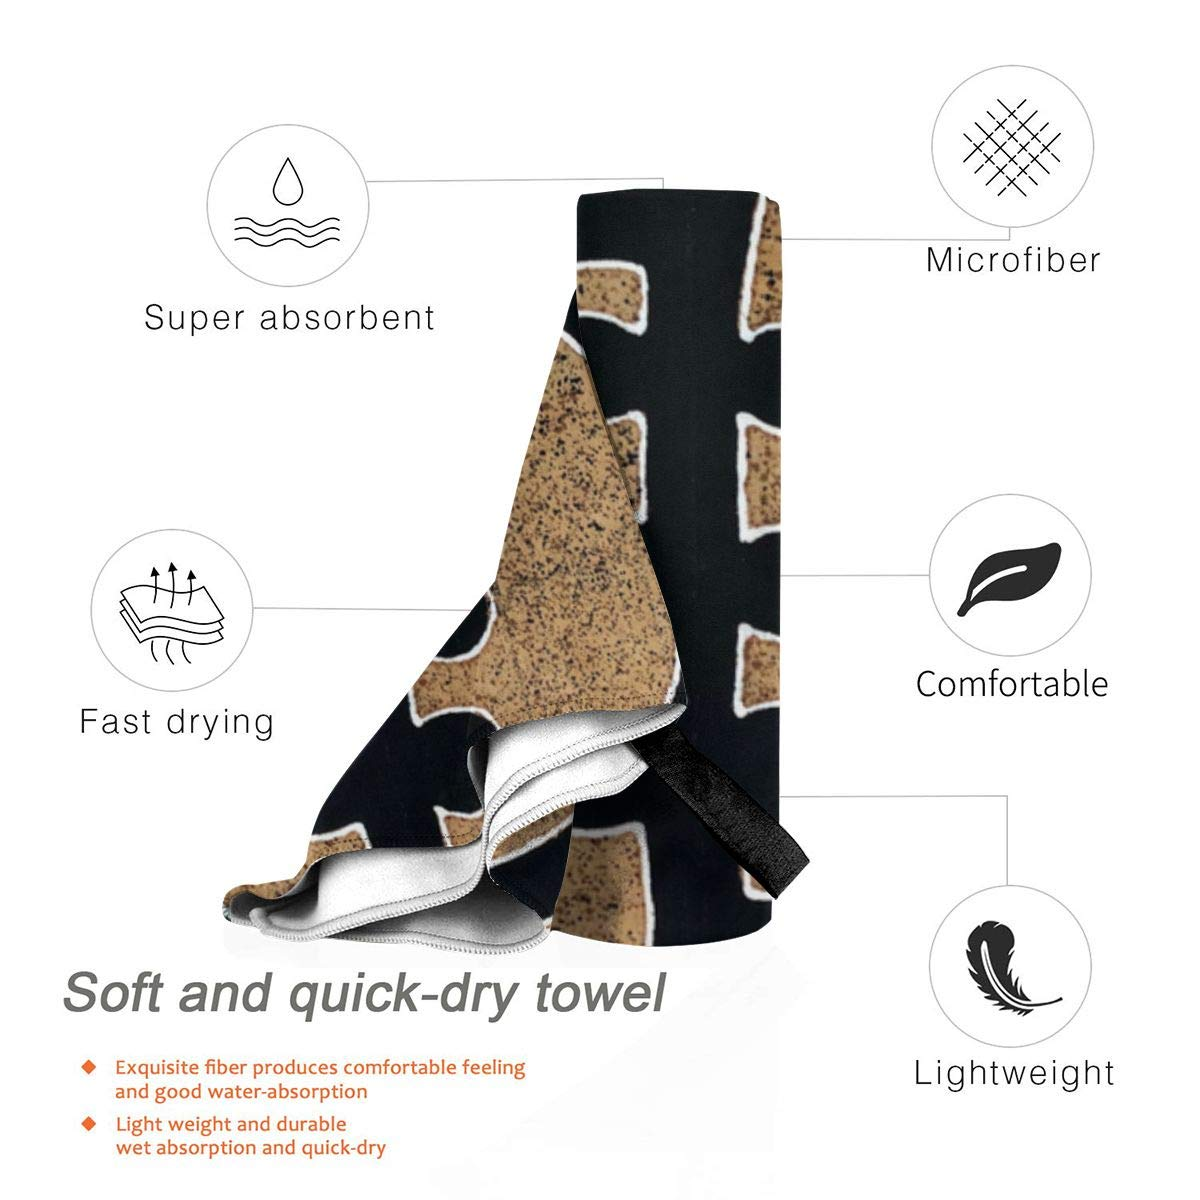 BlueTop Gye Nyame Beach Quick Drying Towel Microfiber Yoga Fitness Absorbent Towel Outdoor Climbing Quick Drying Towel